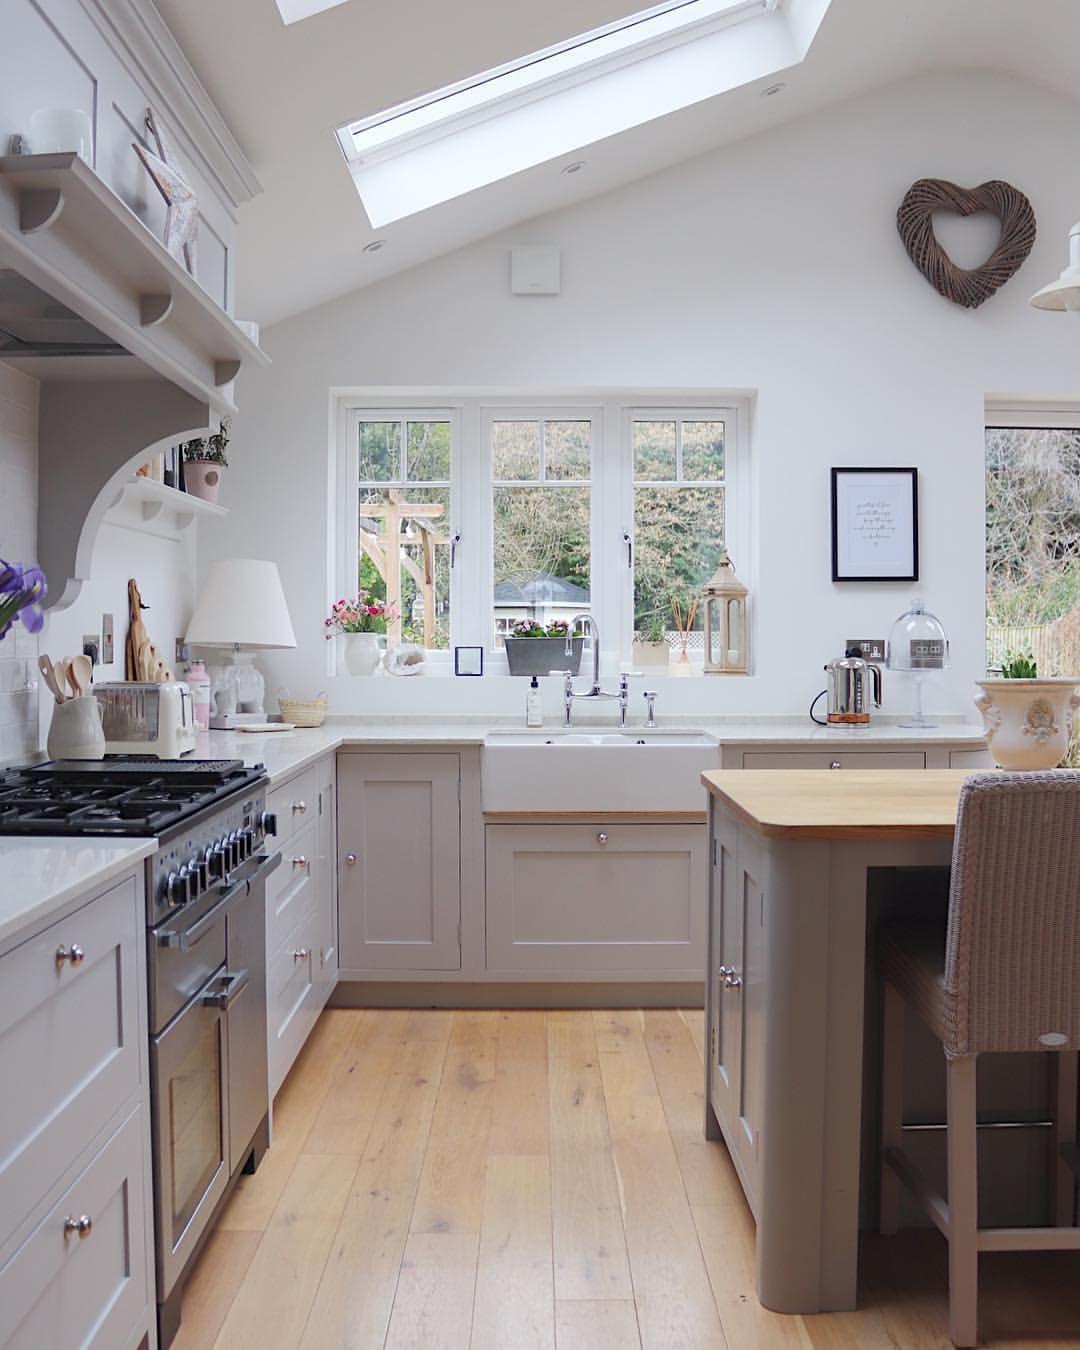 Kitchen Remodel Katy Tx: Pin By Bryan Stutzman On Dream House In 2019